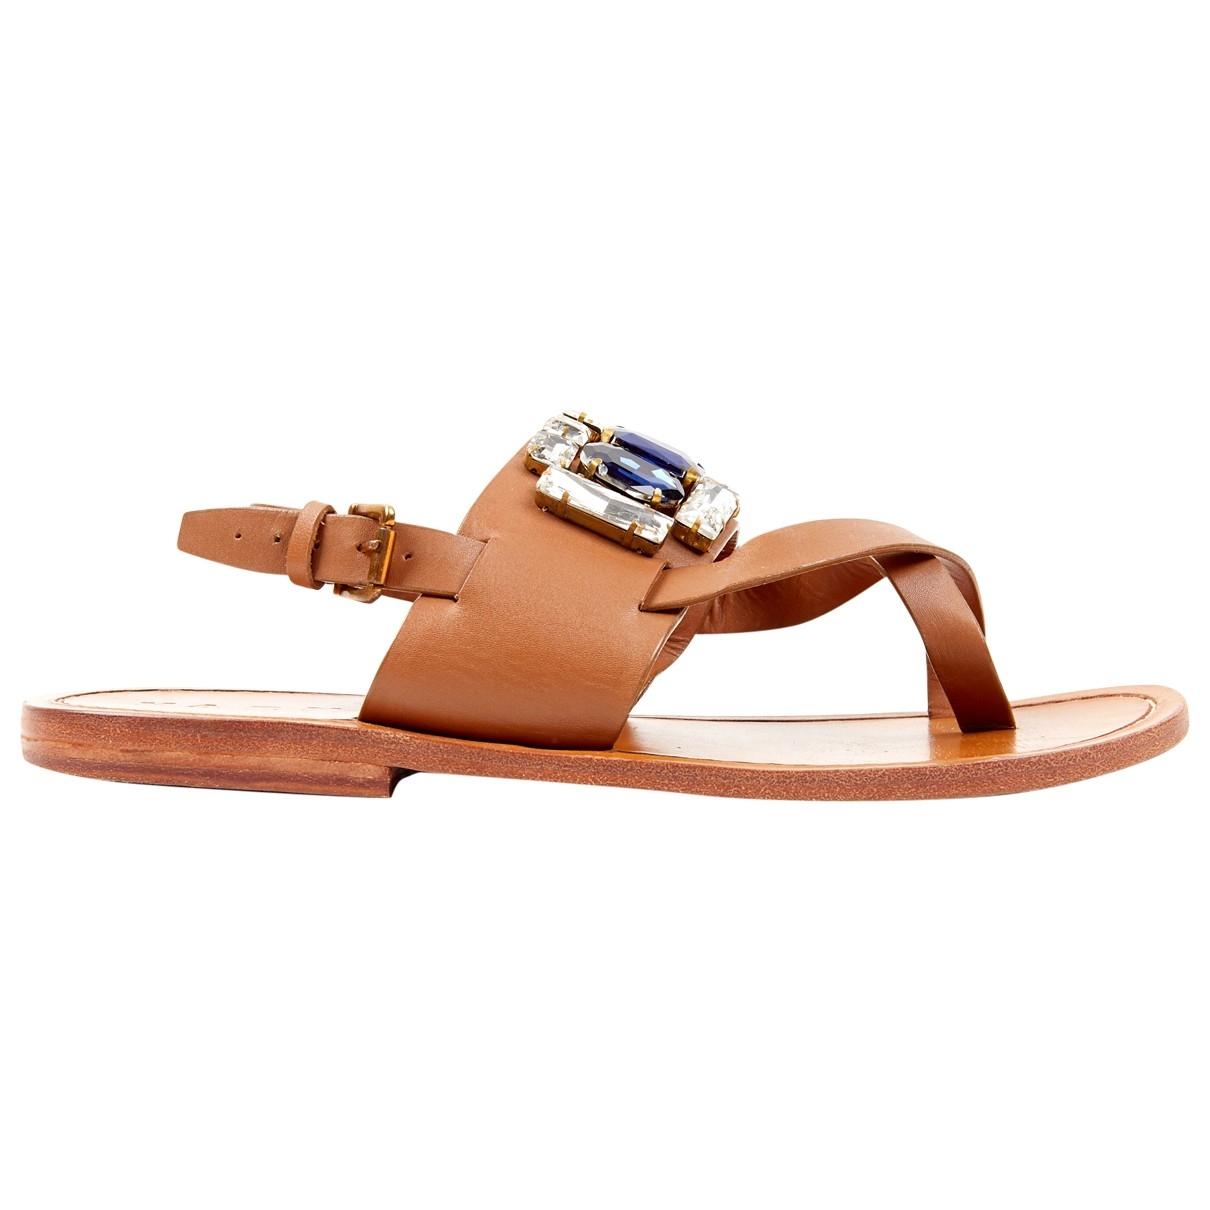 Marni \N Camel Leather Sandals for Women 38 EU